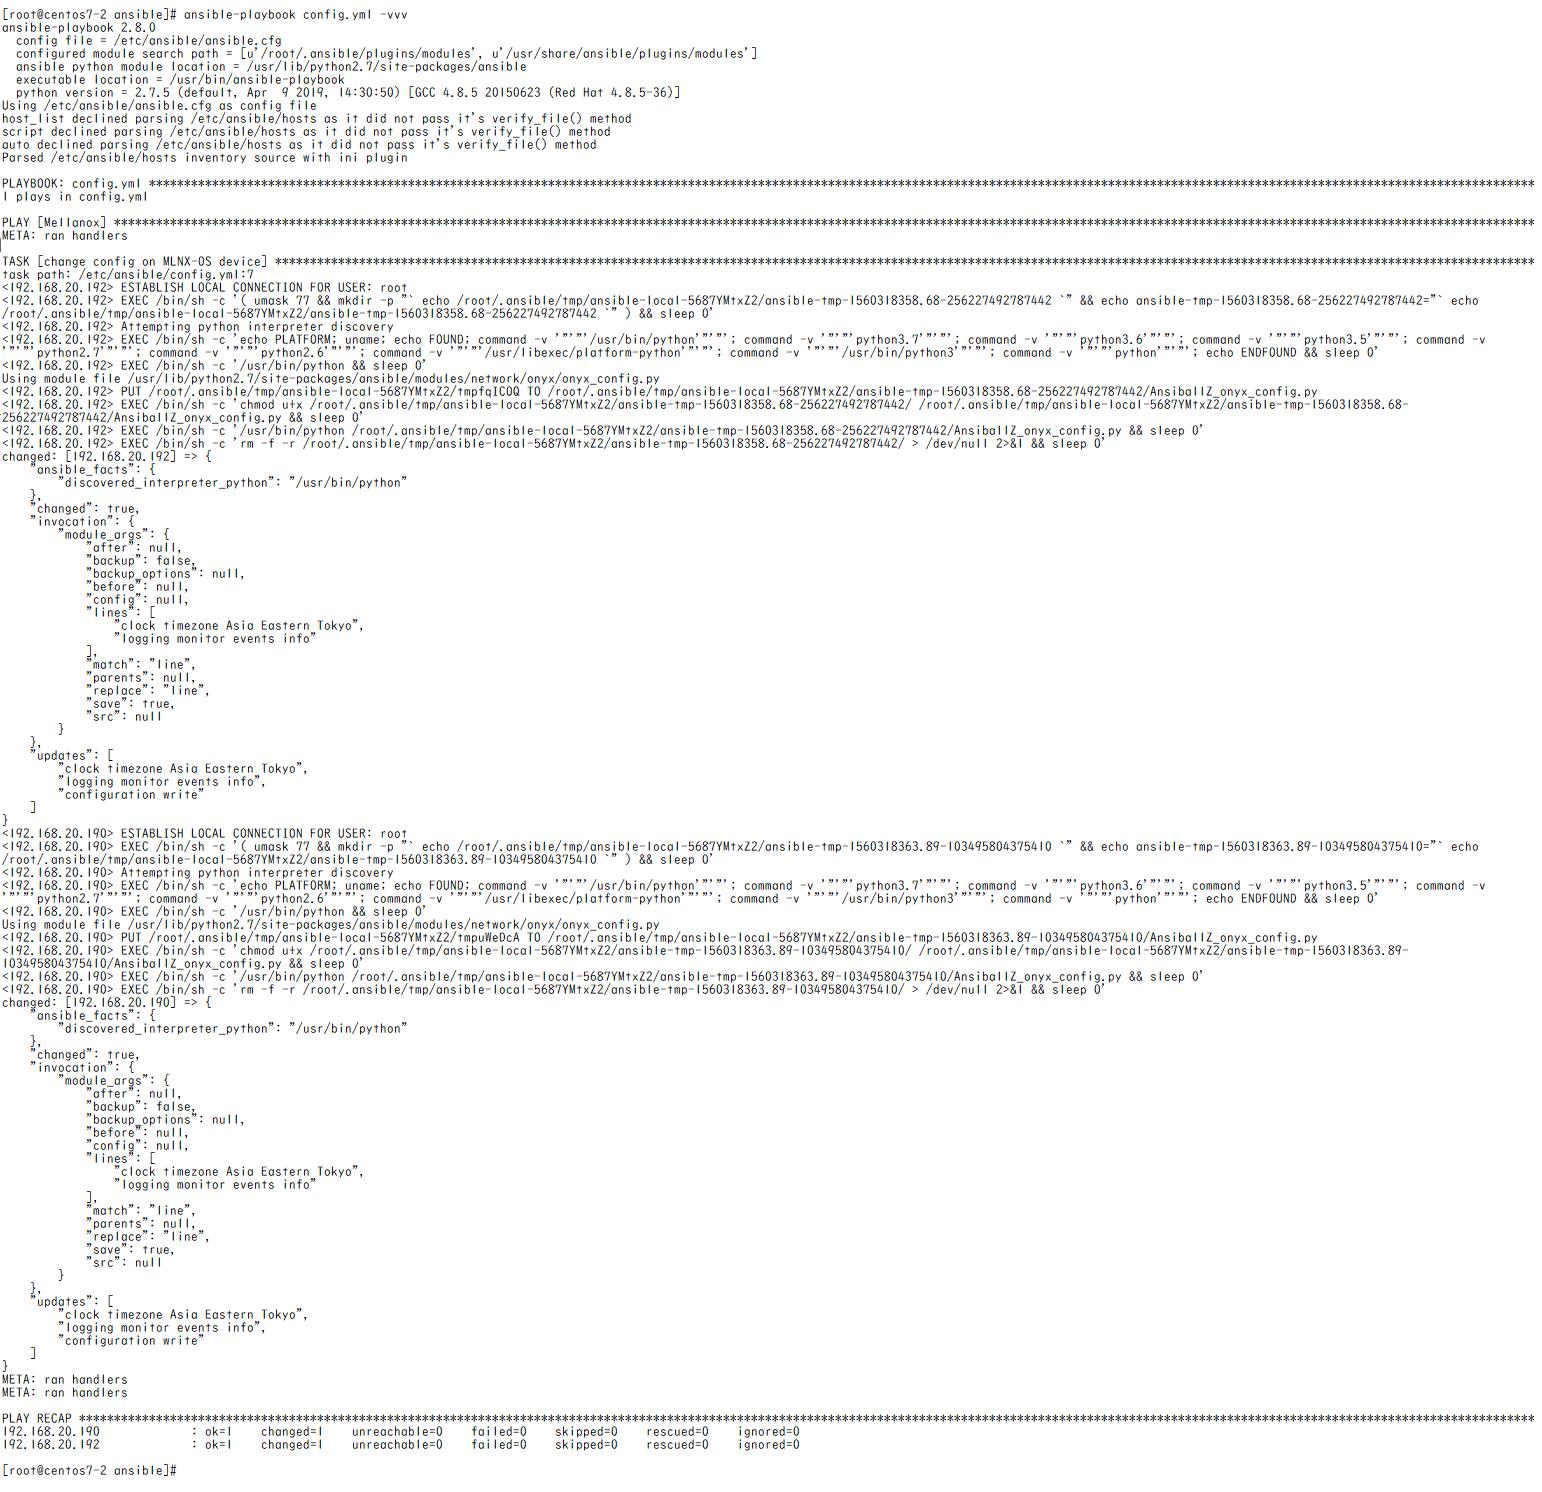 verboseオプションを使用し、debug出力を入れたconfig.ymlの実行結果